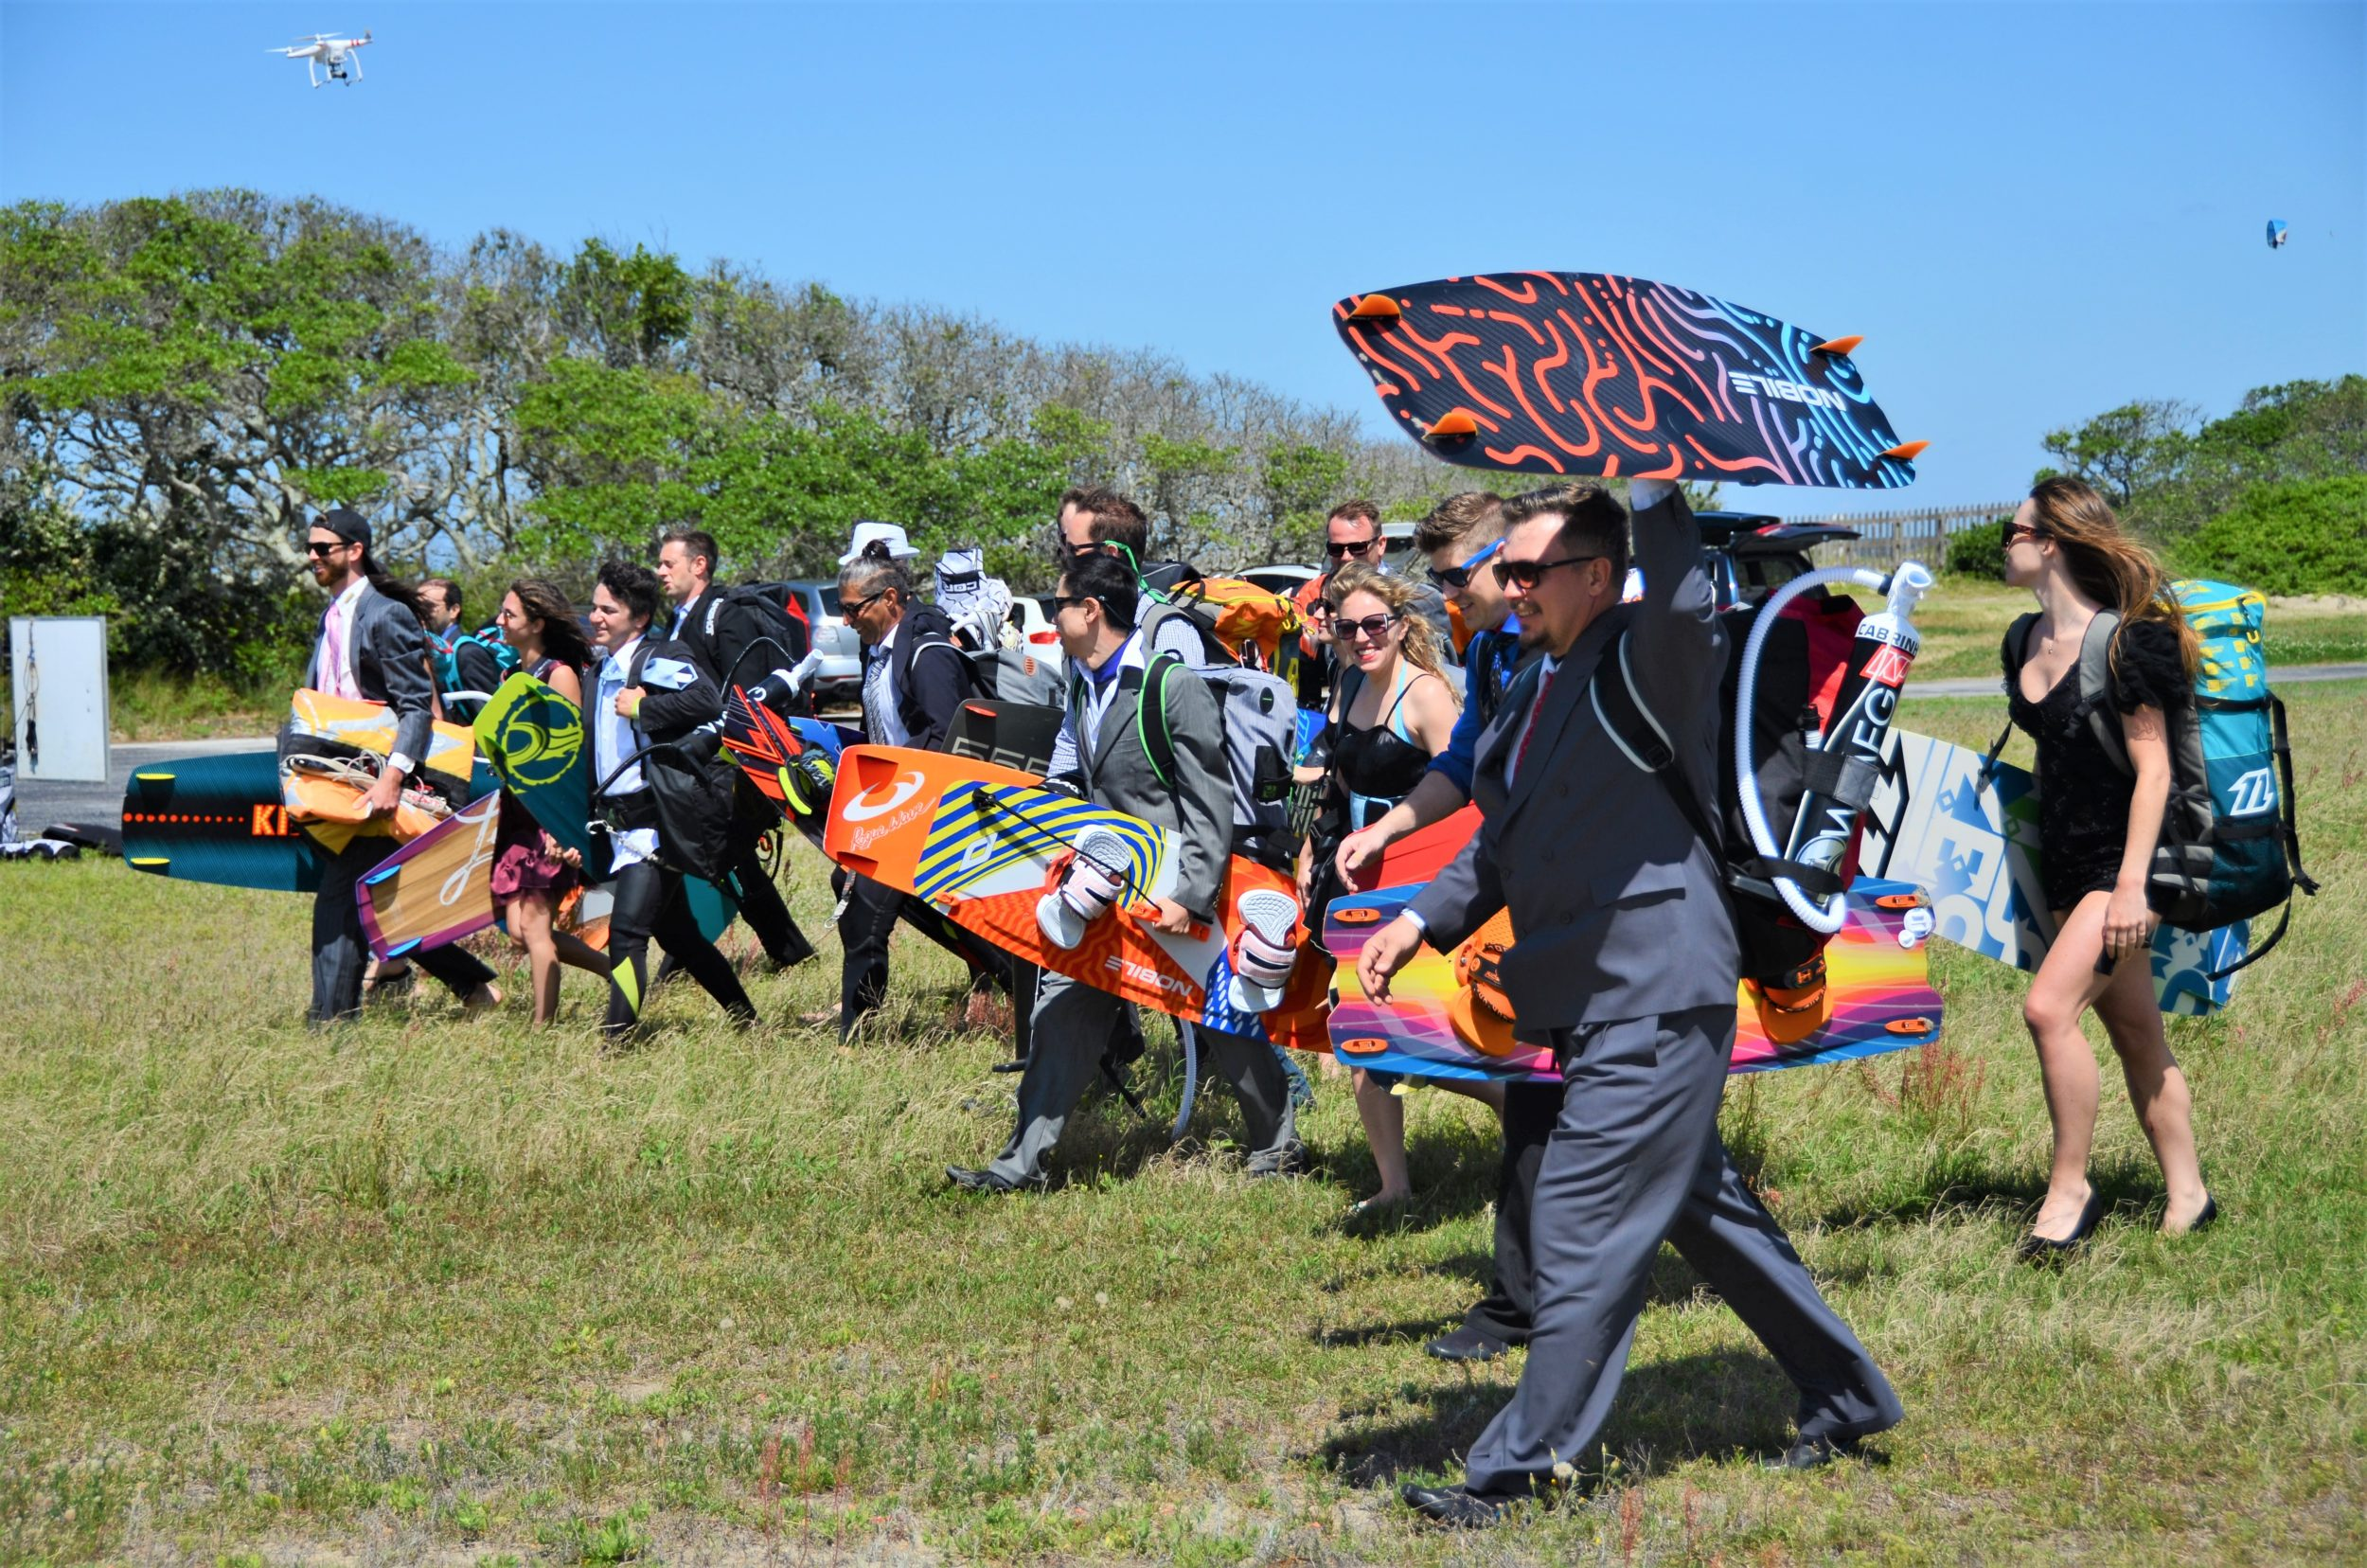 canadian kitesurfing society toronto (35)